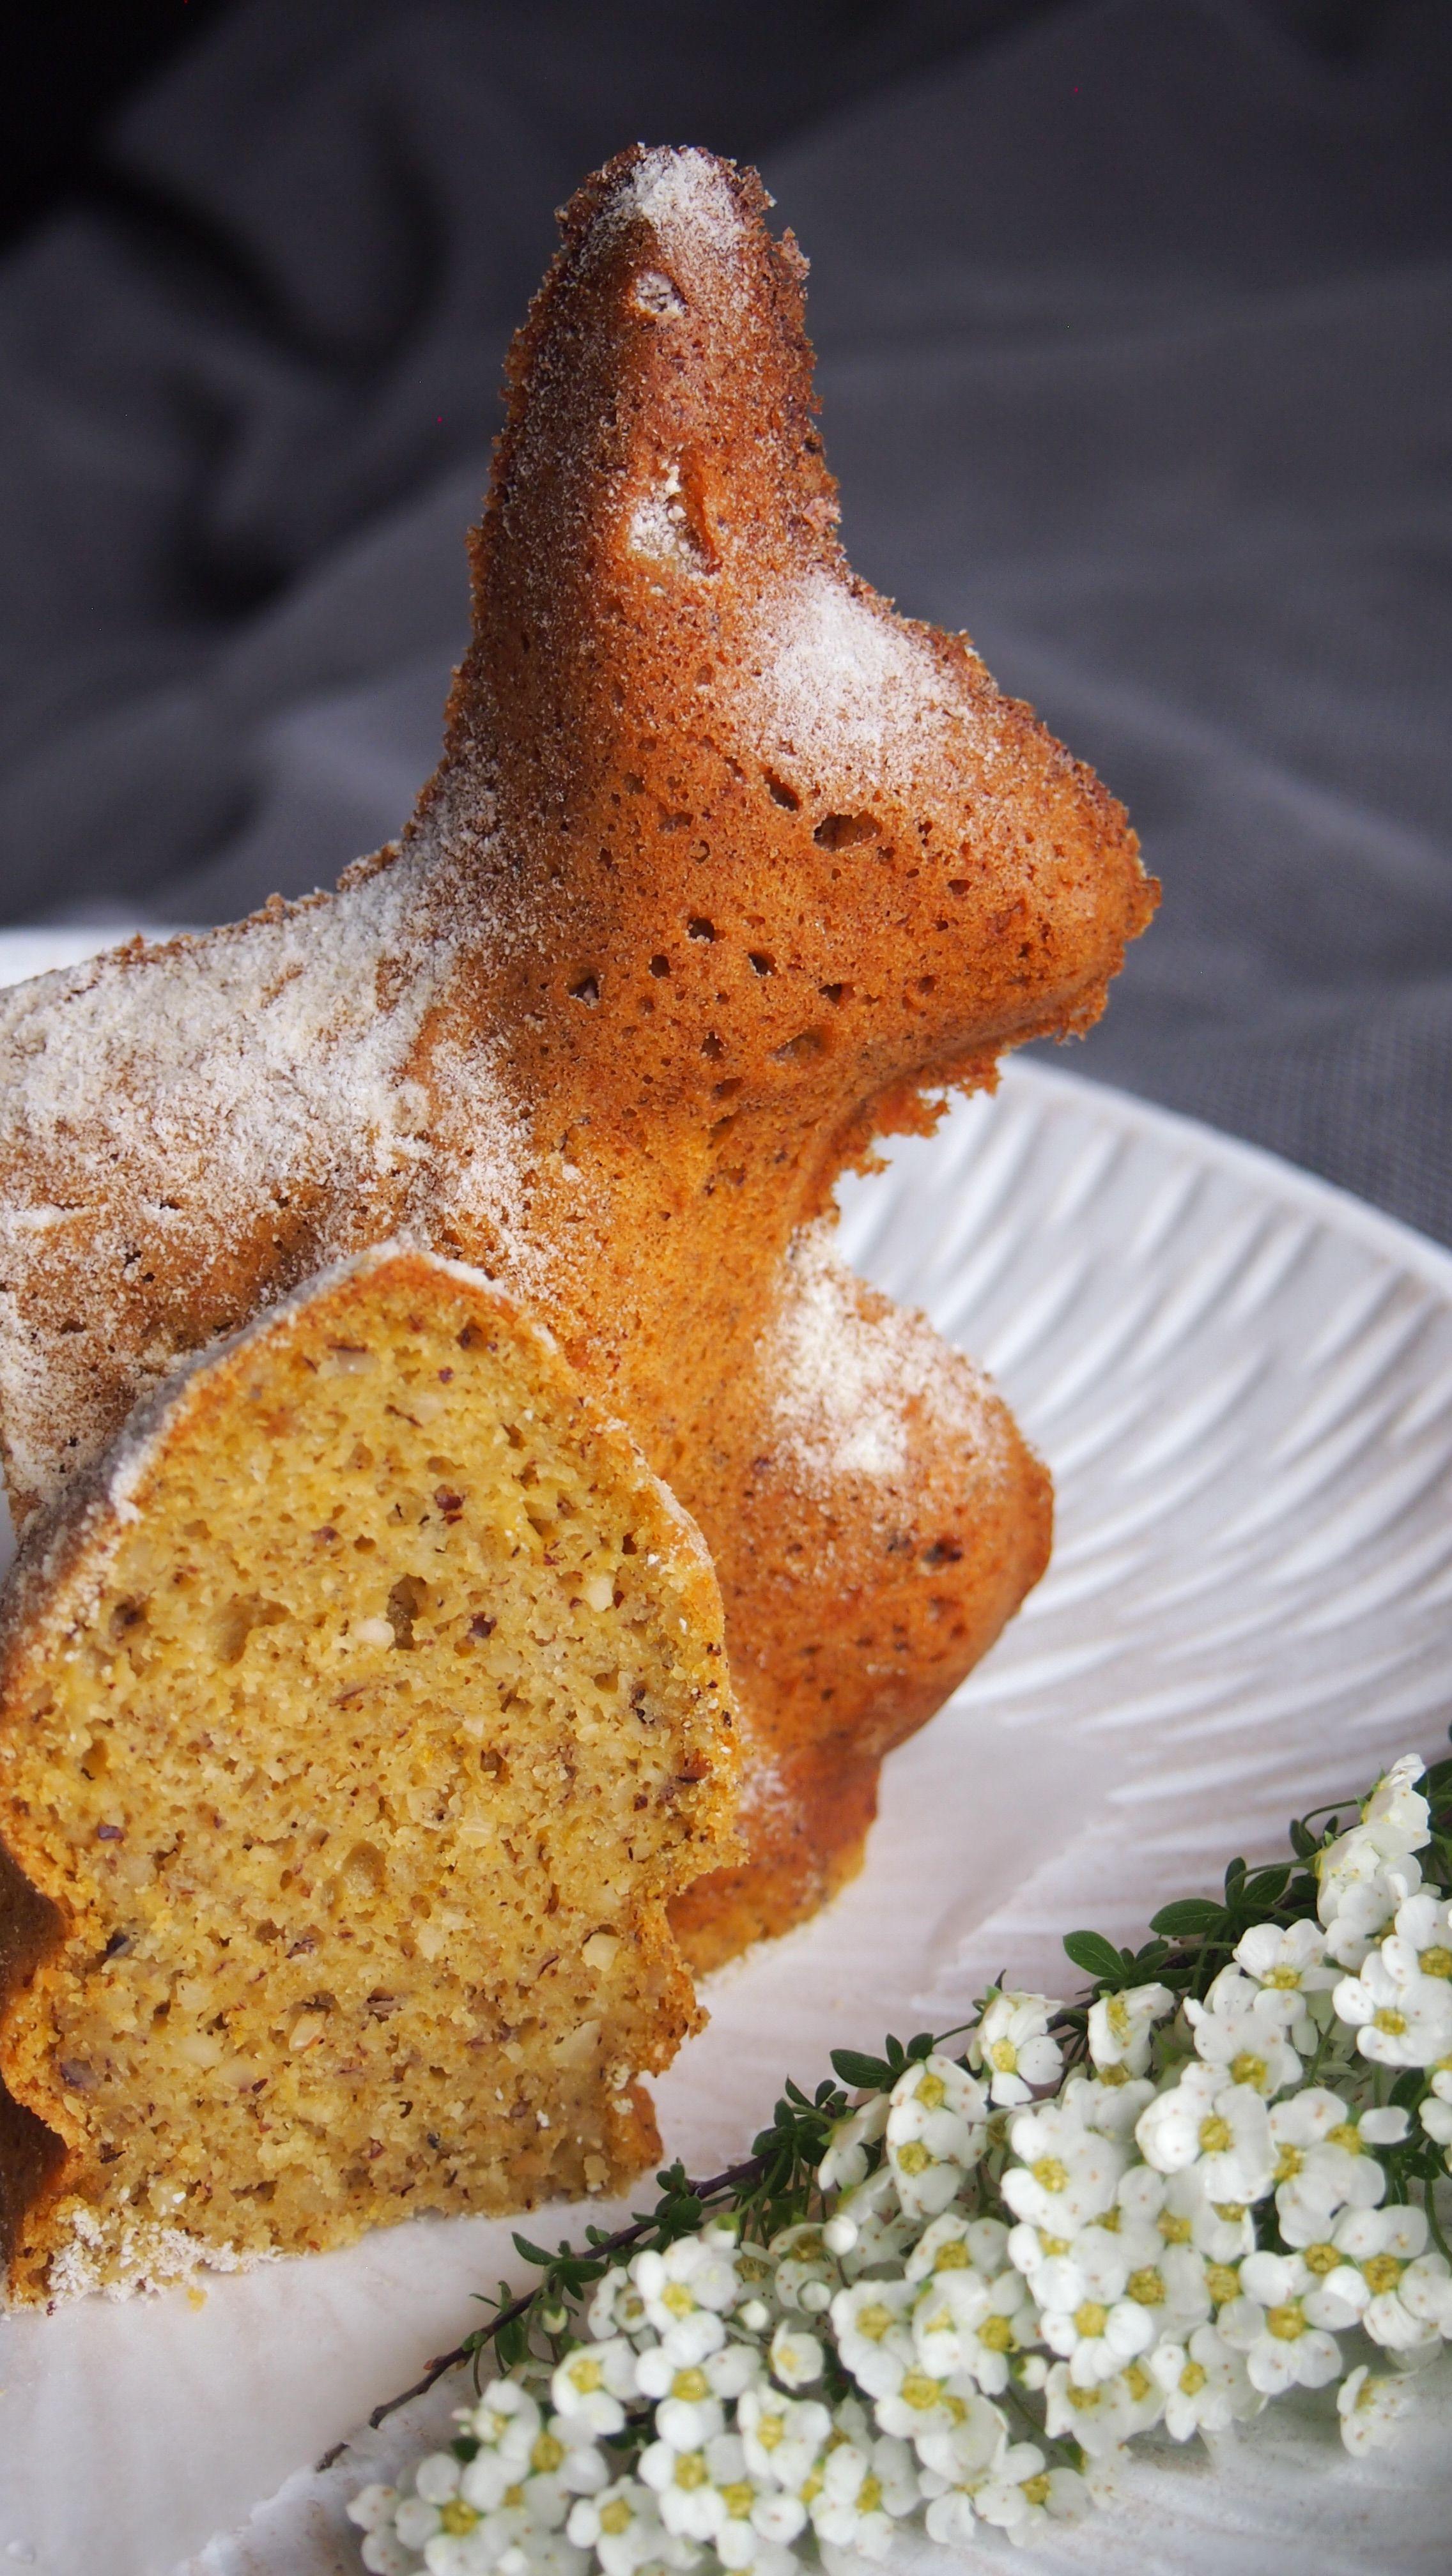 Osterhasen Kuchen ohne Zucker (vegan) - Bake it naked